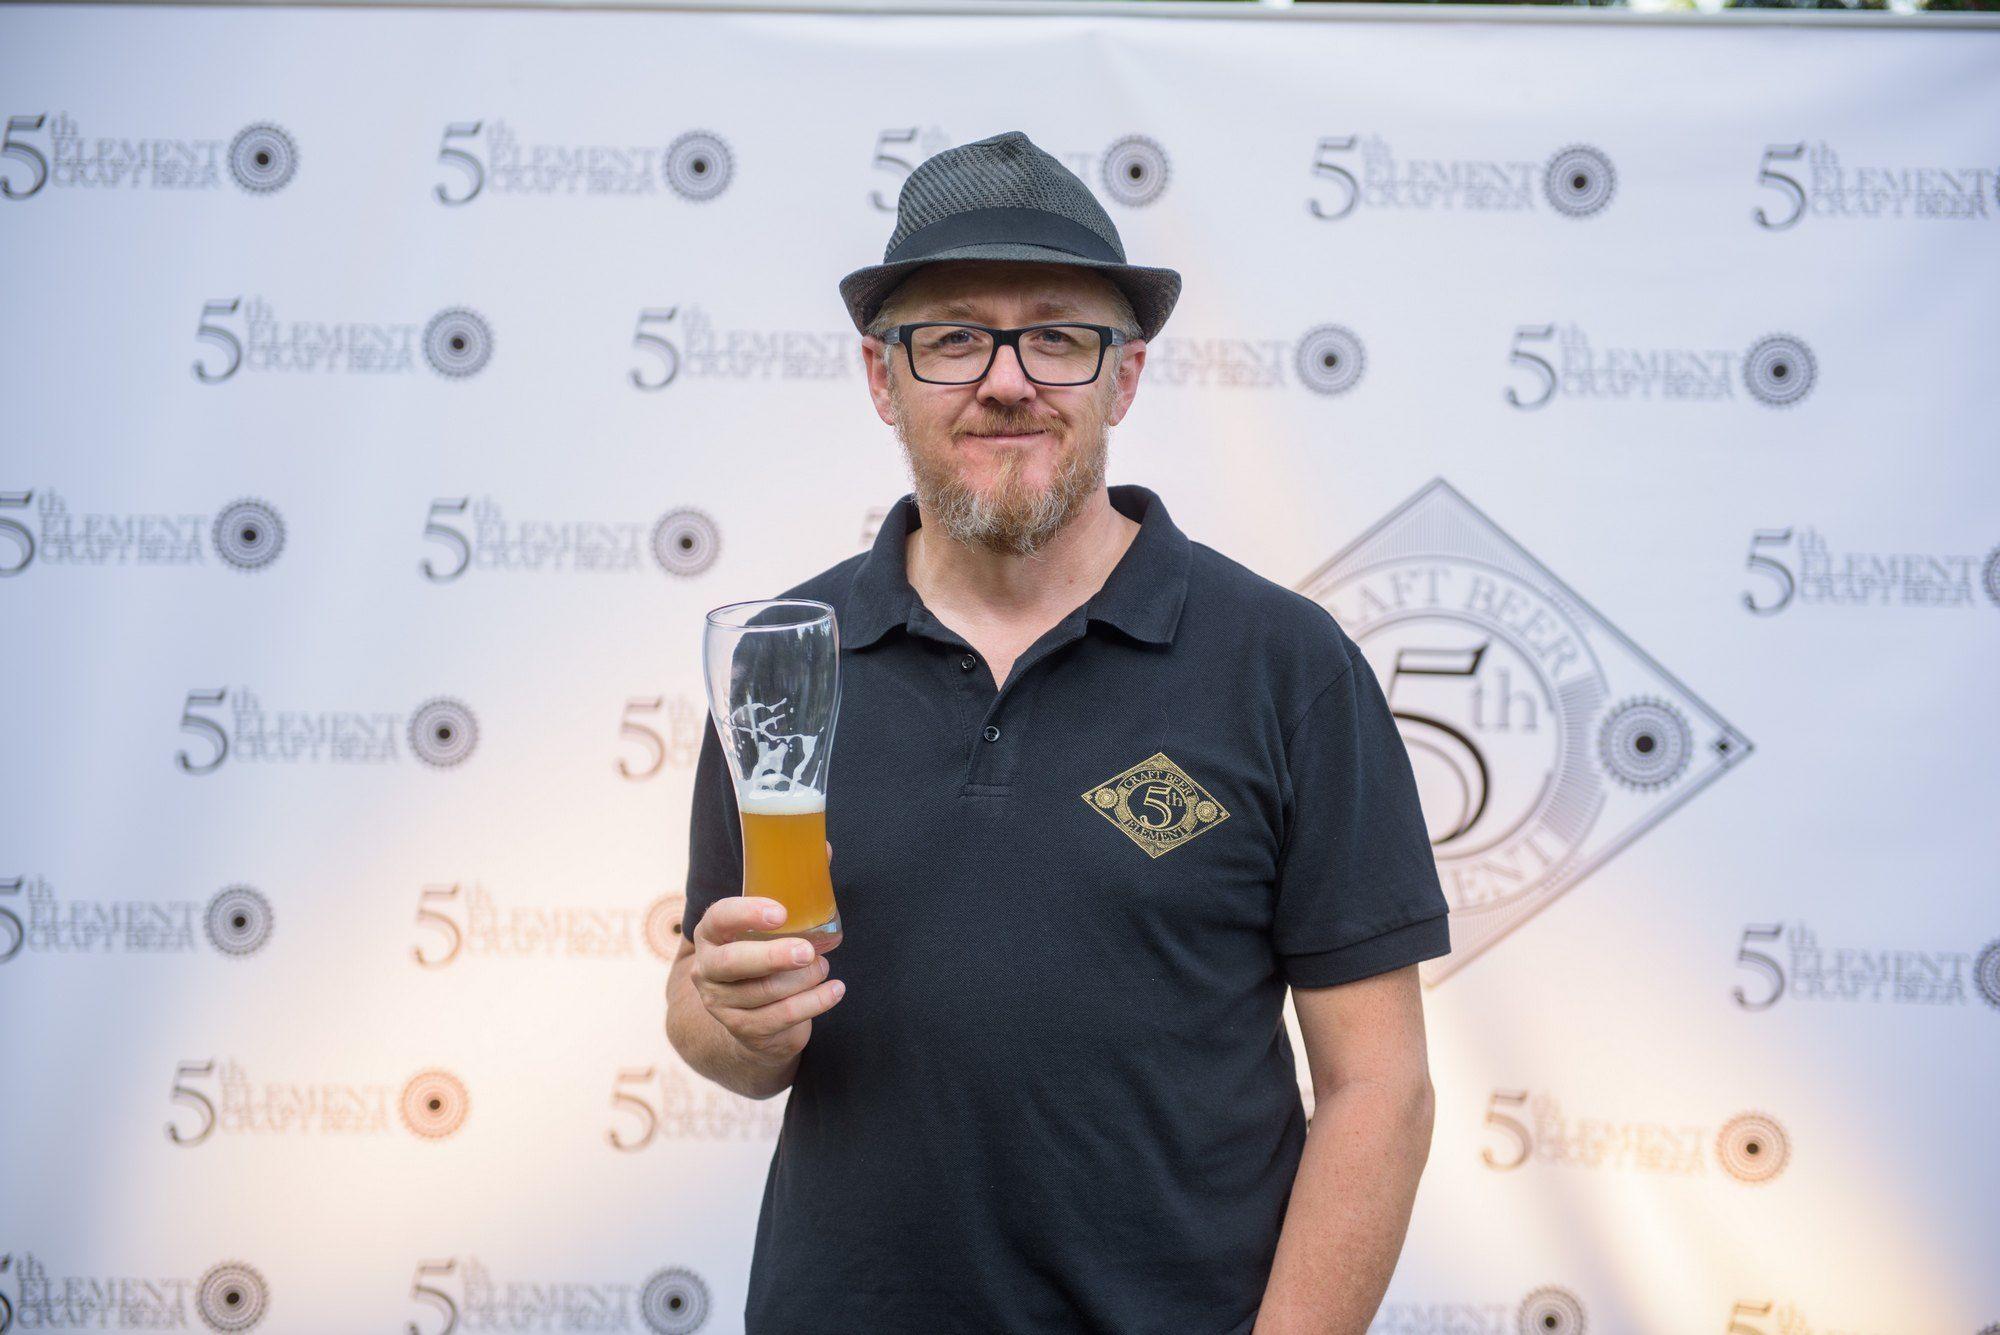 12_Krešo Marić, majstor pivar iz Pivovare Daruvar